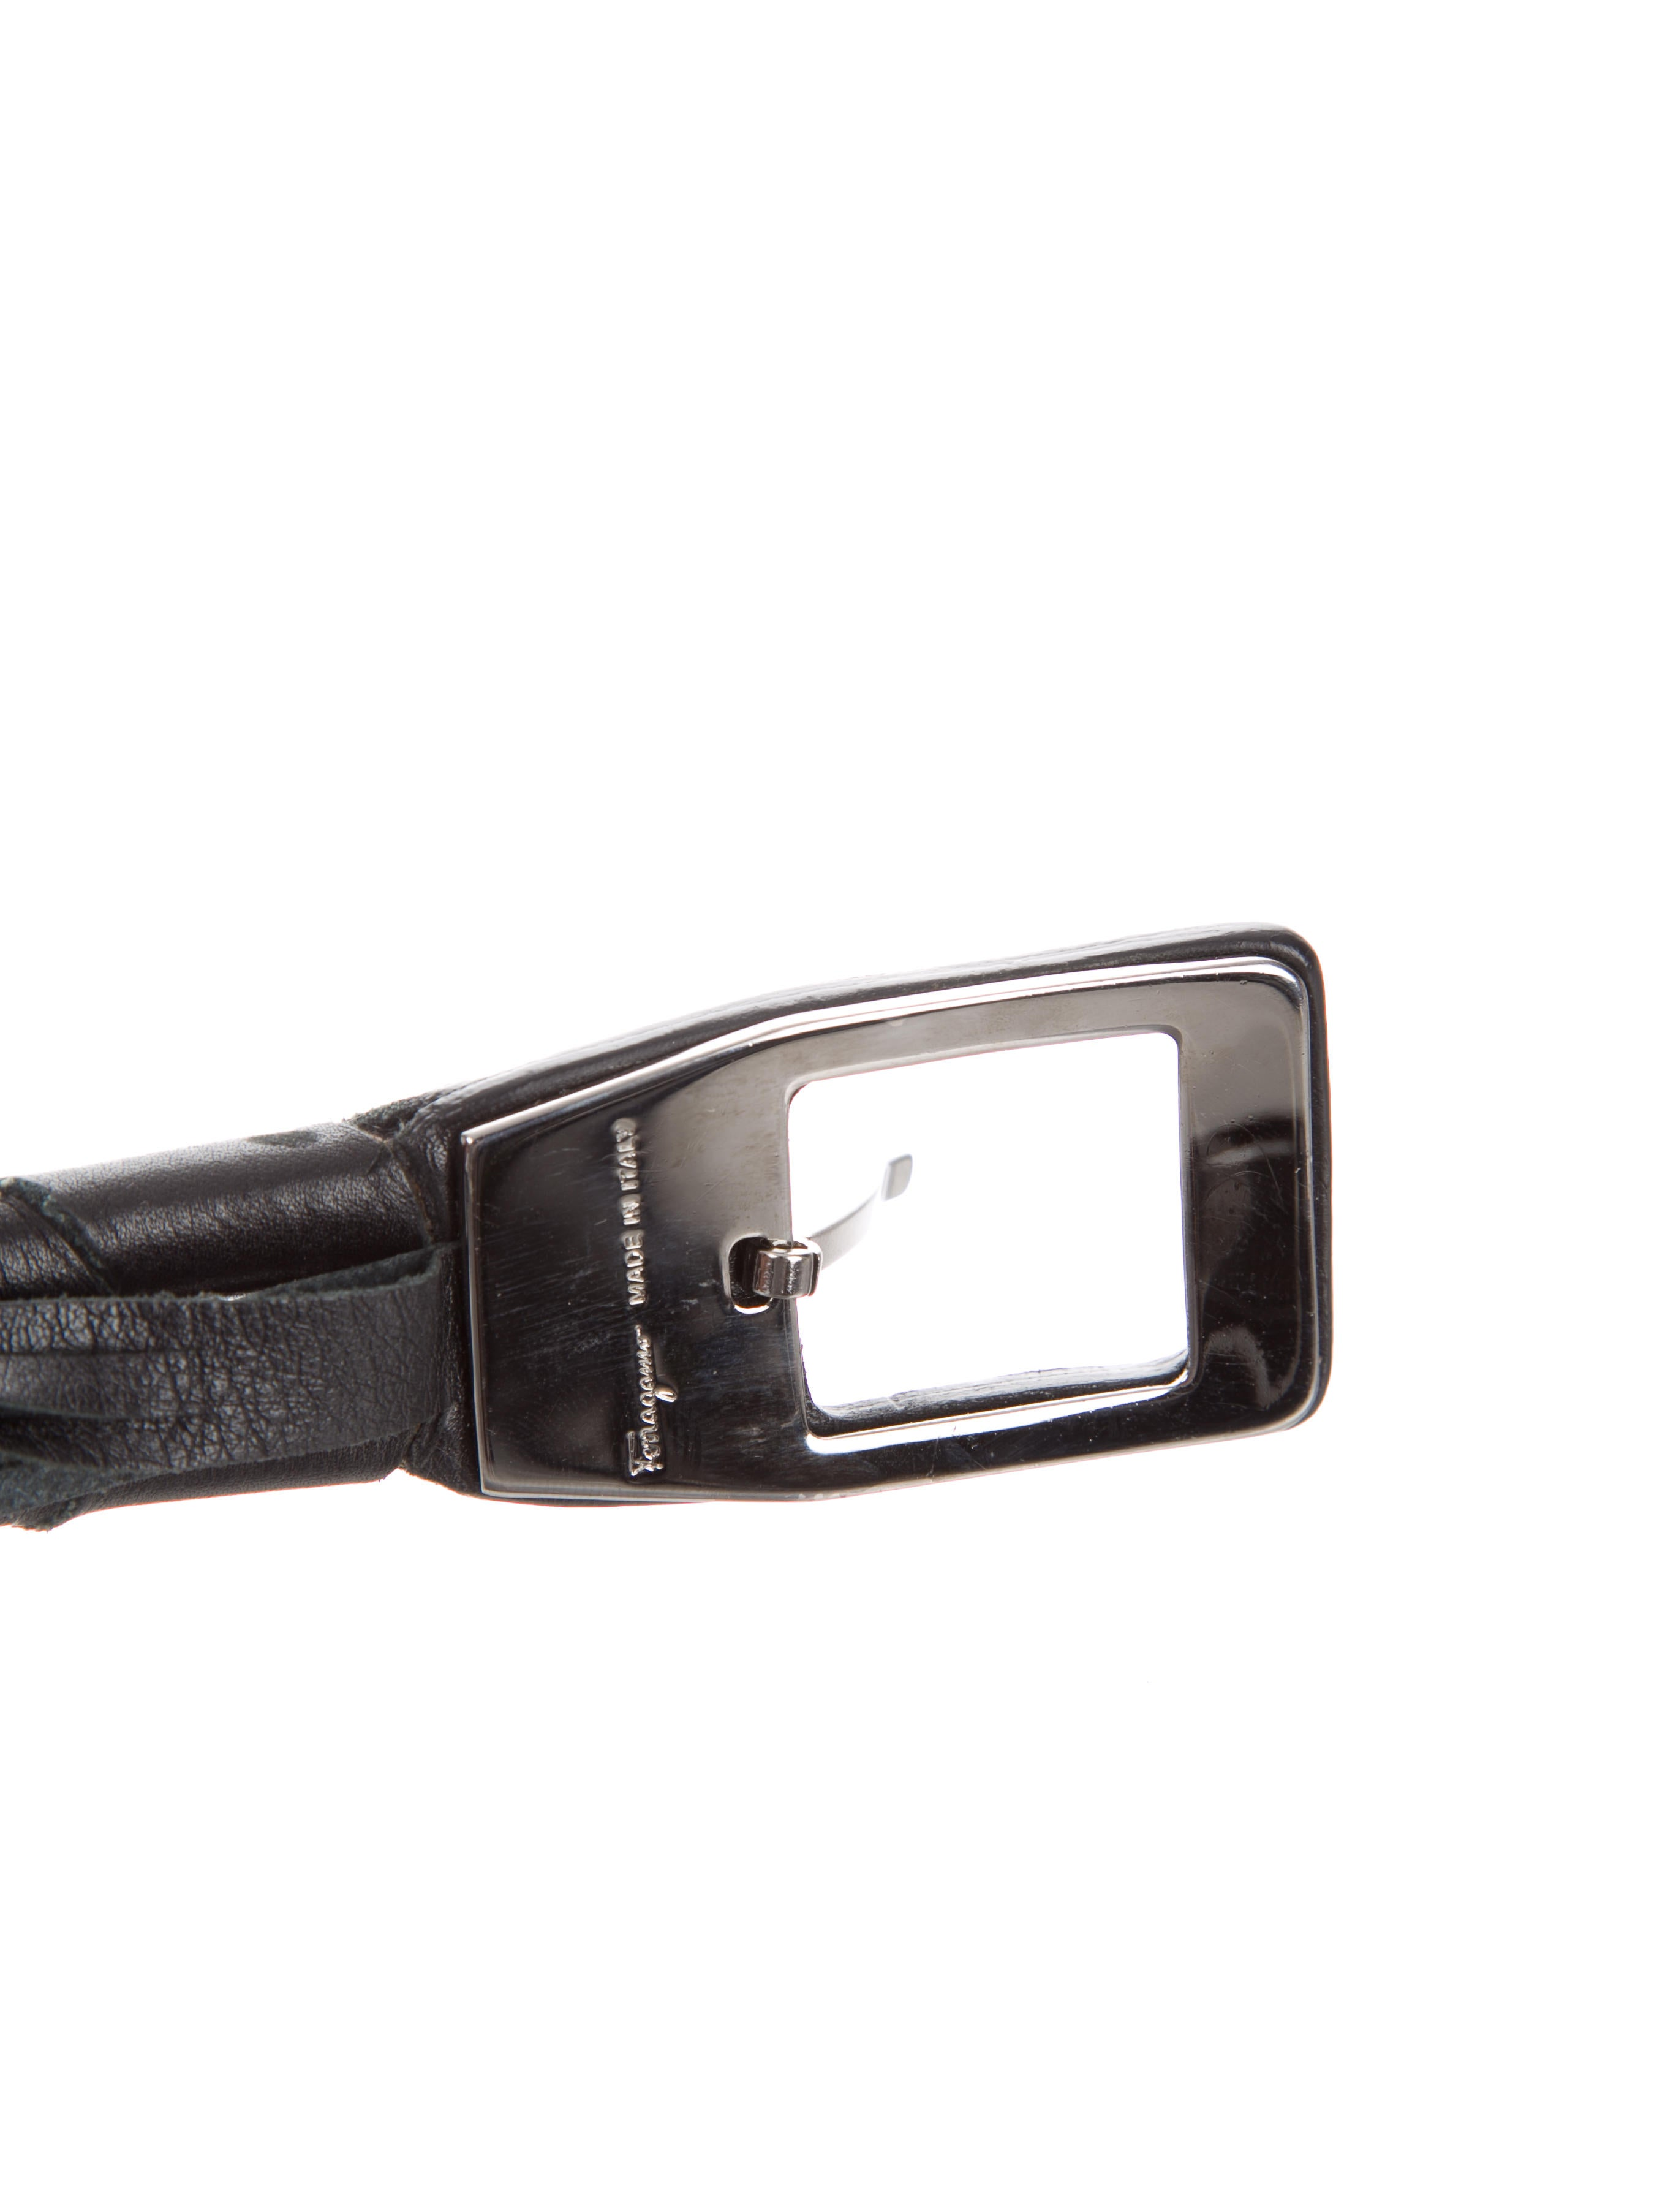 salvatore ferragamo woven leather belt accessories